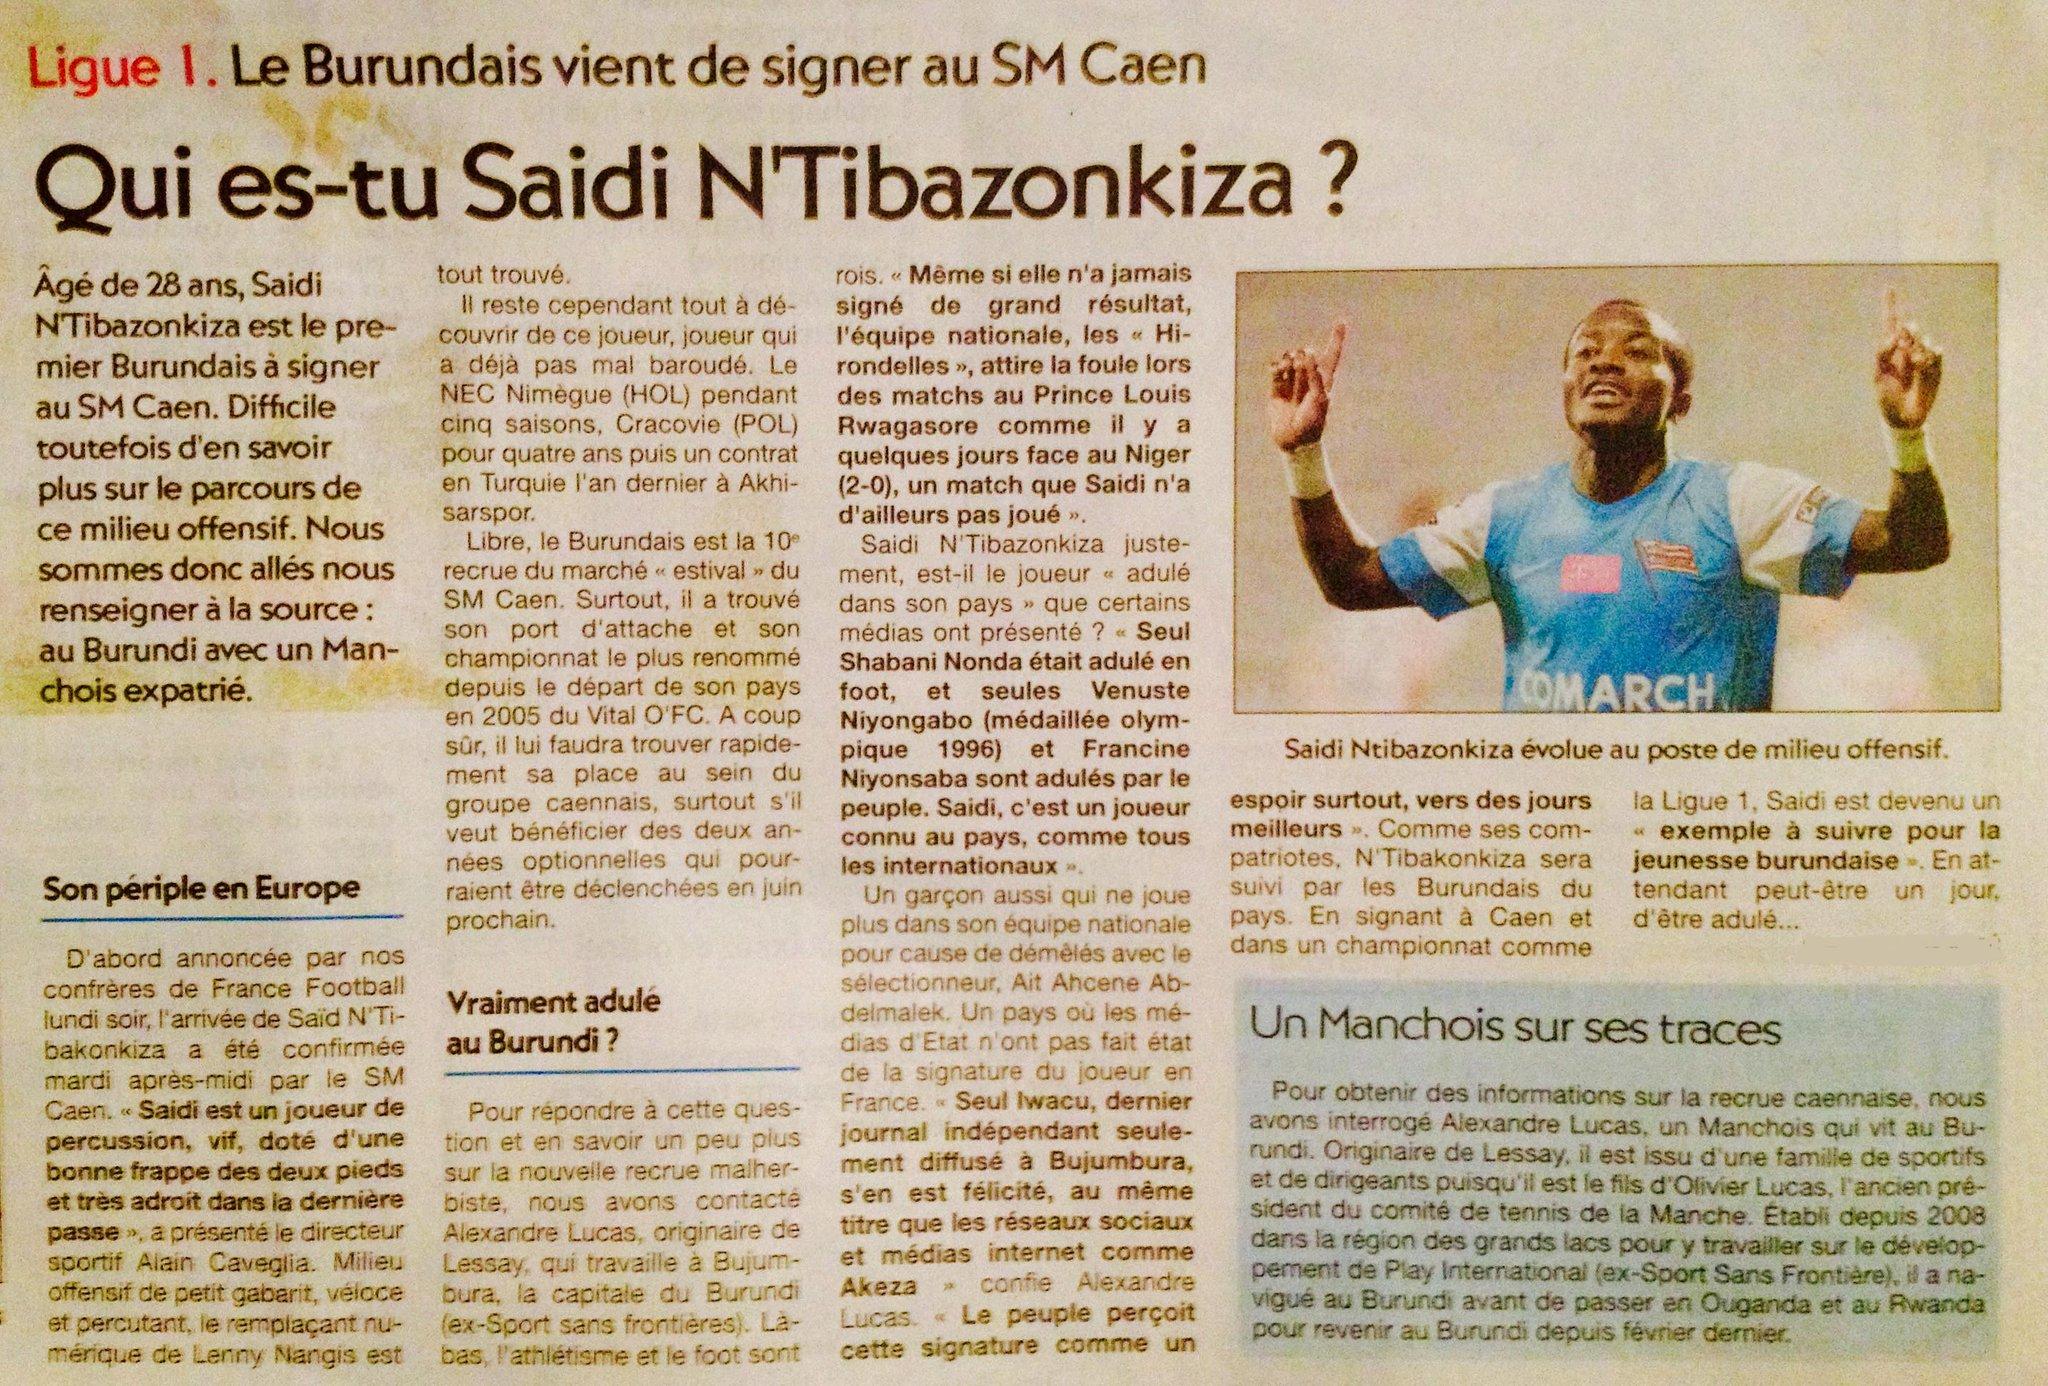 [Arrivée] Saidi Ntibazonkiza / Libre CPFw1_TWwAA1ZoG